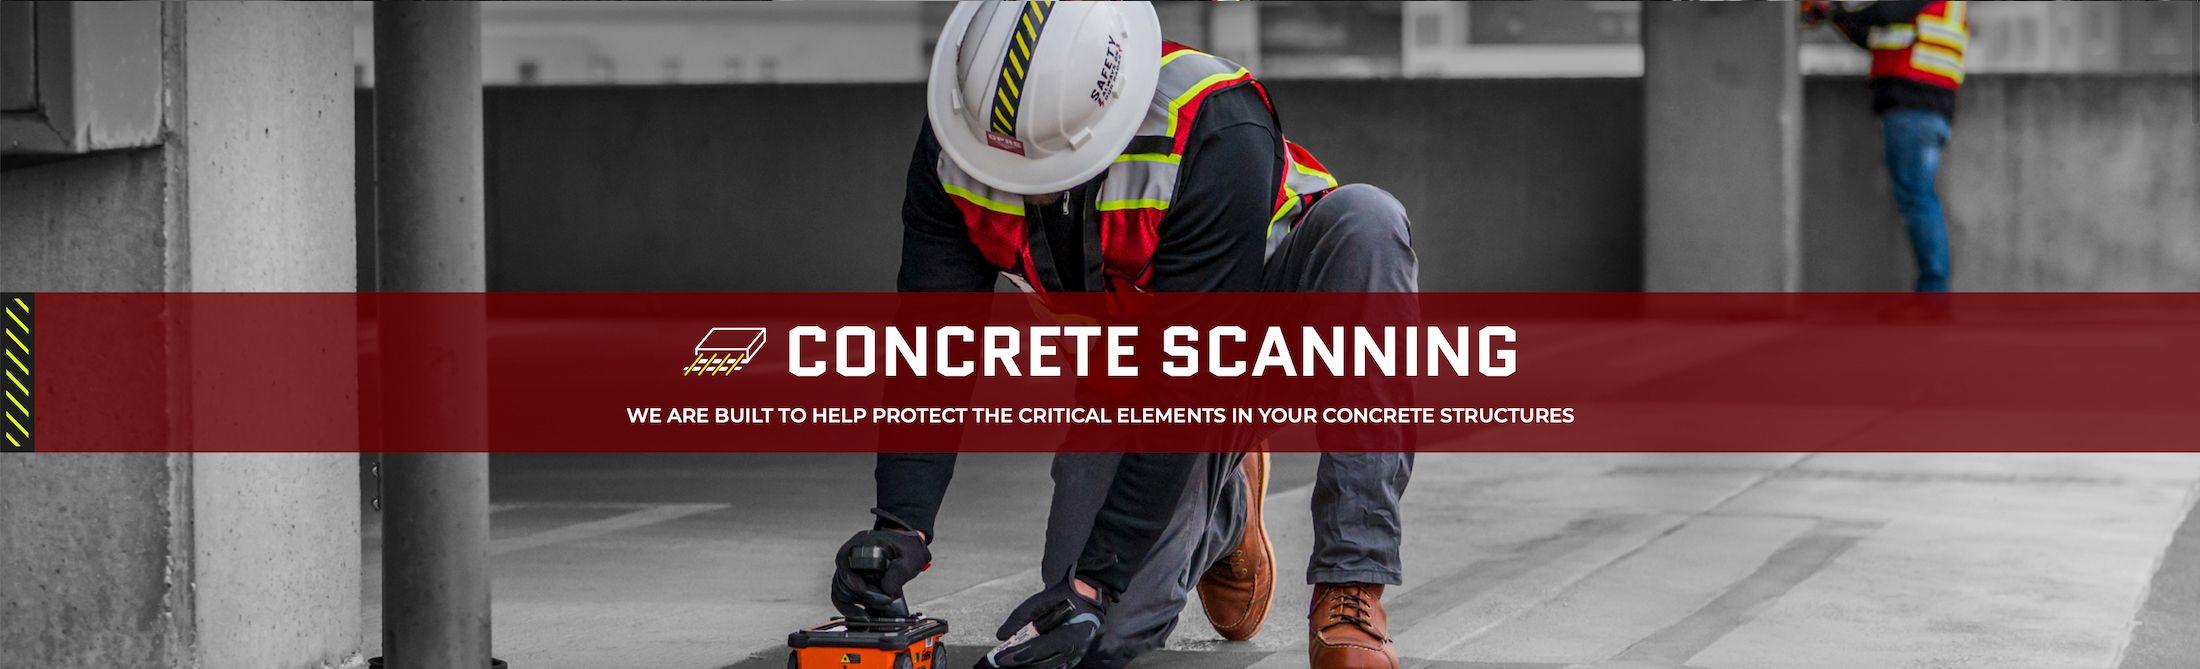 concrete-scanning.jpg